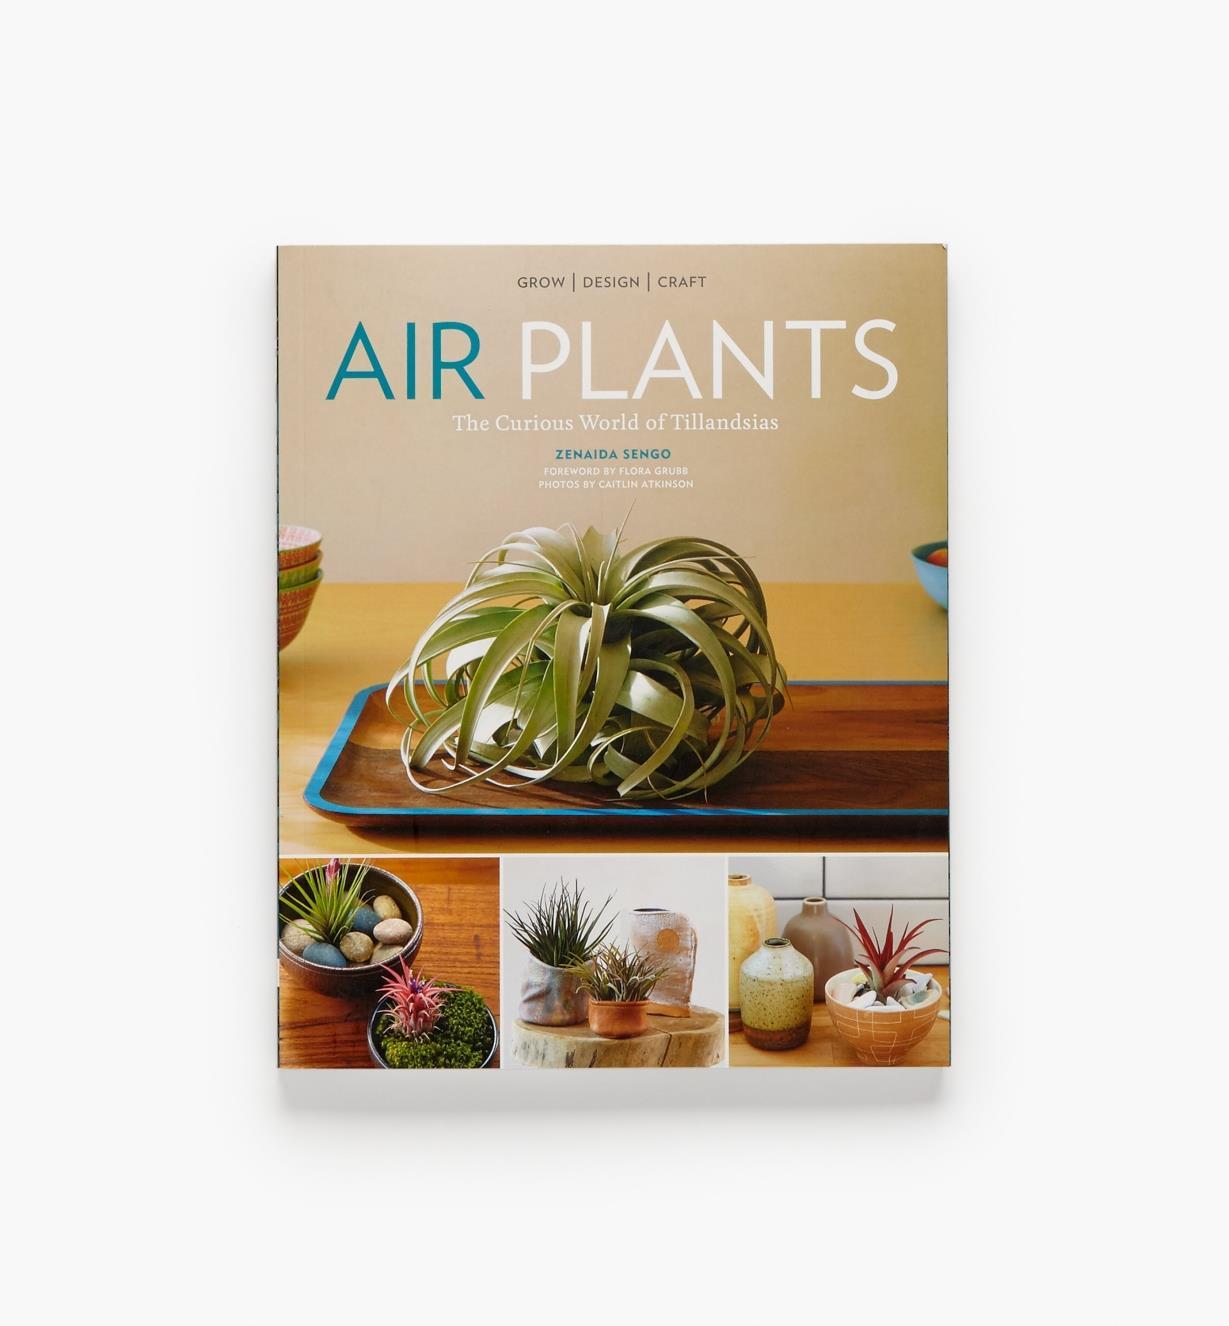 LA963 - Air Plants